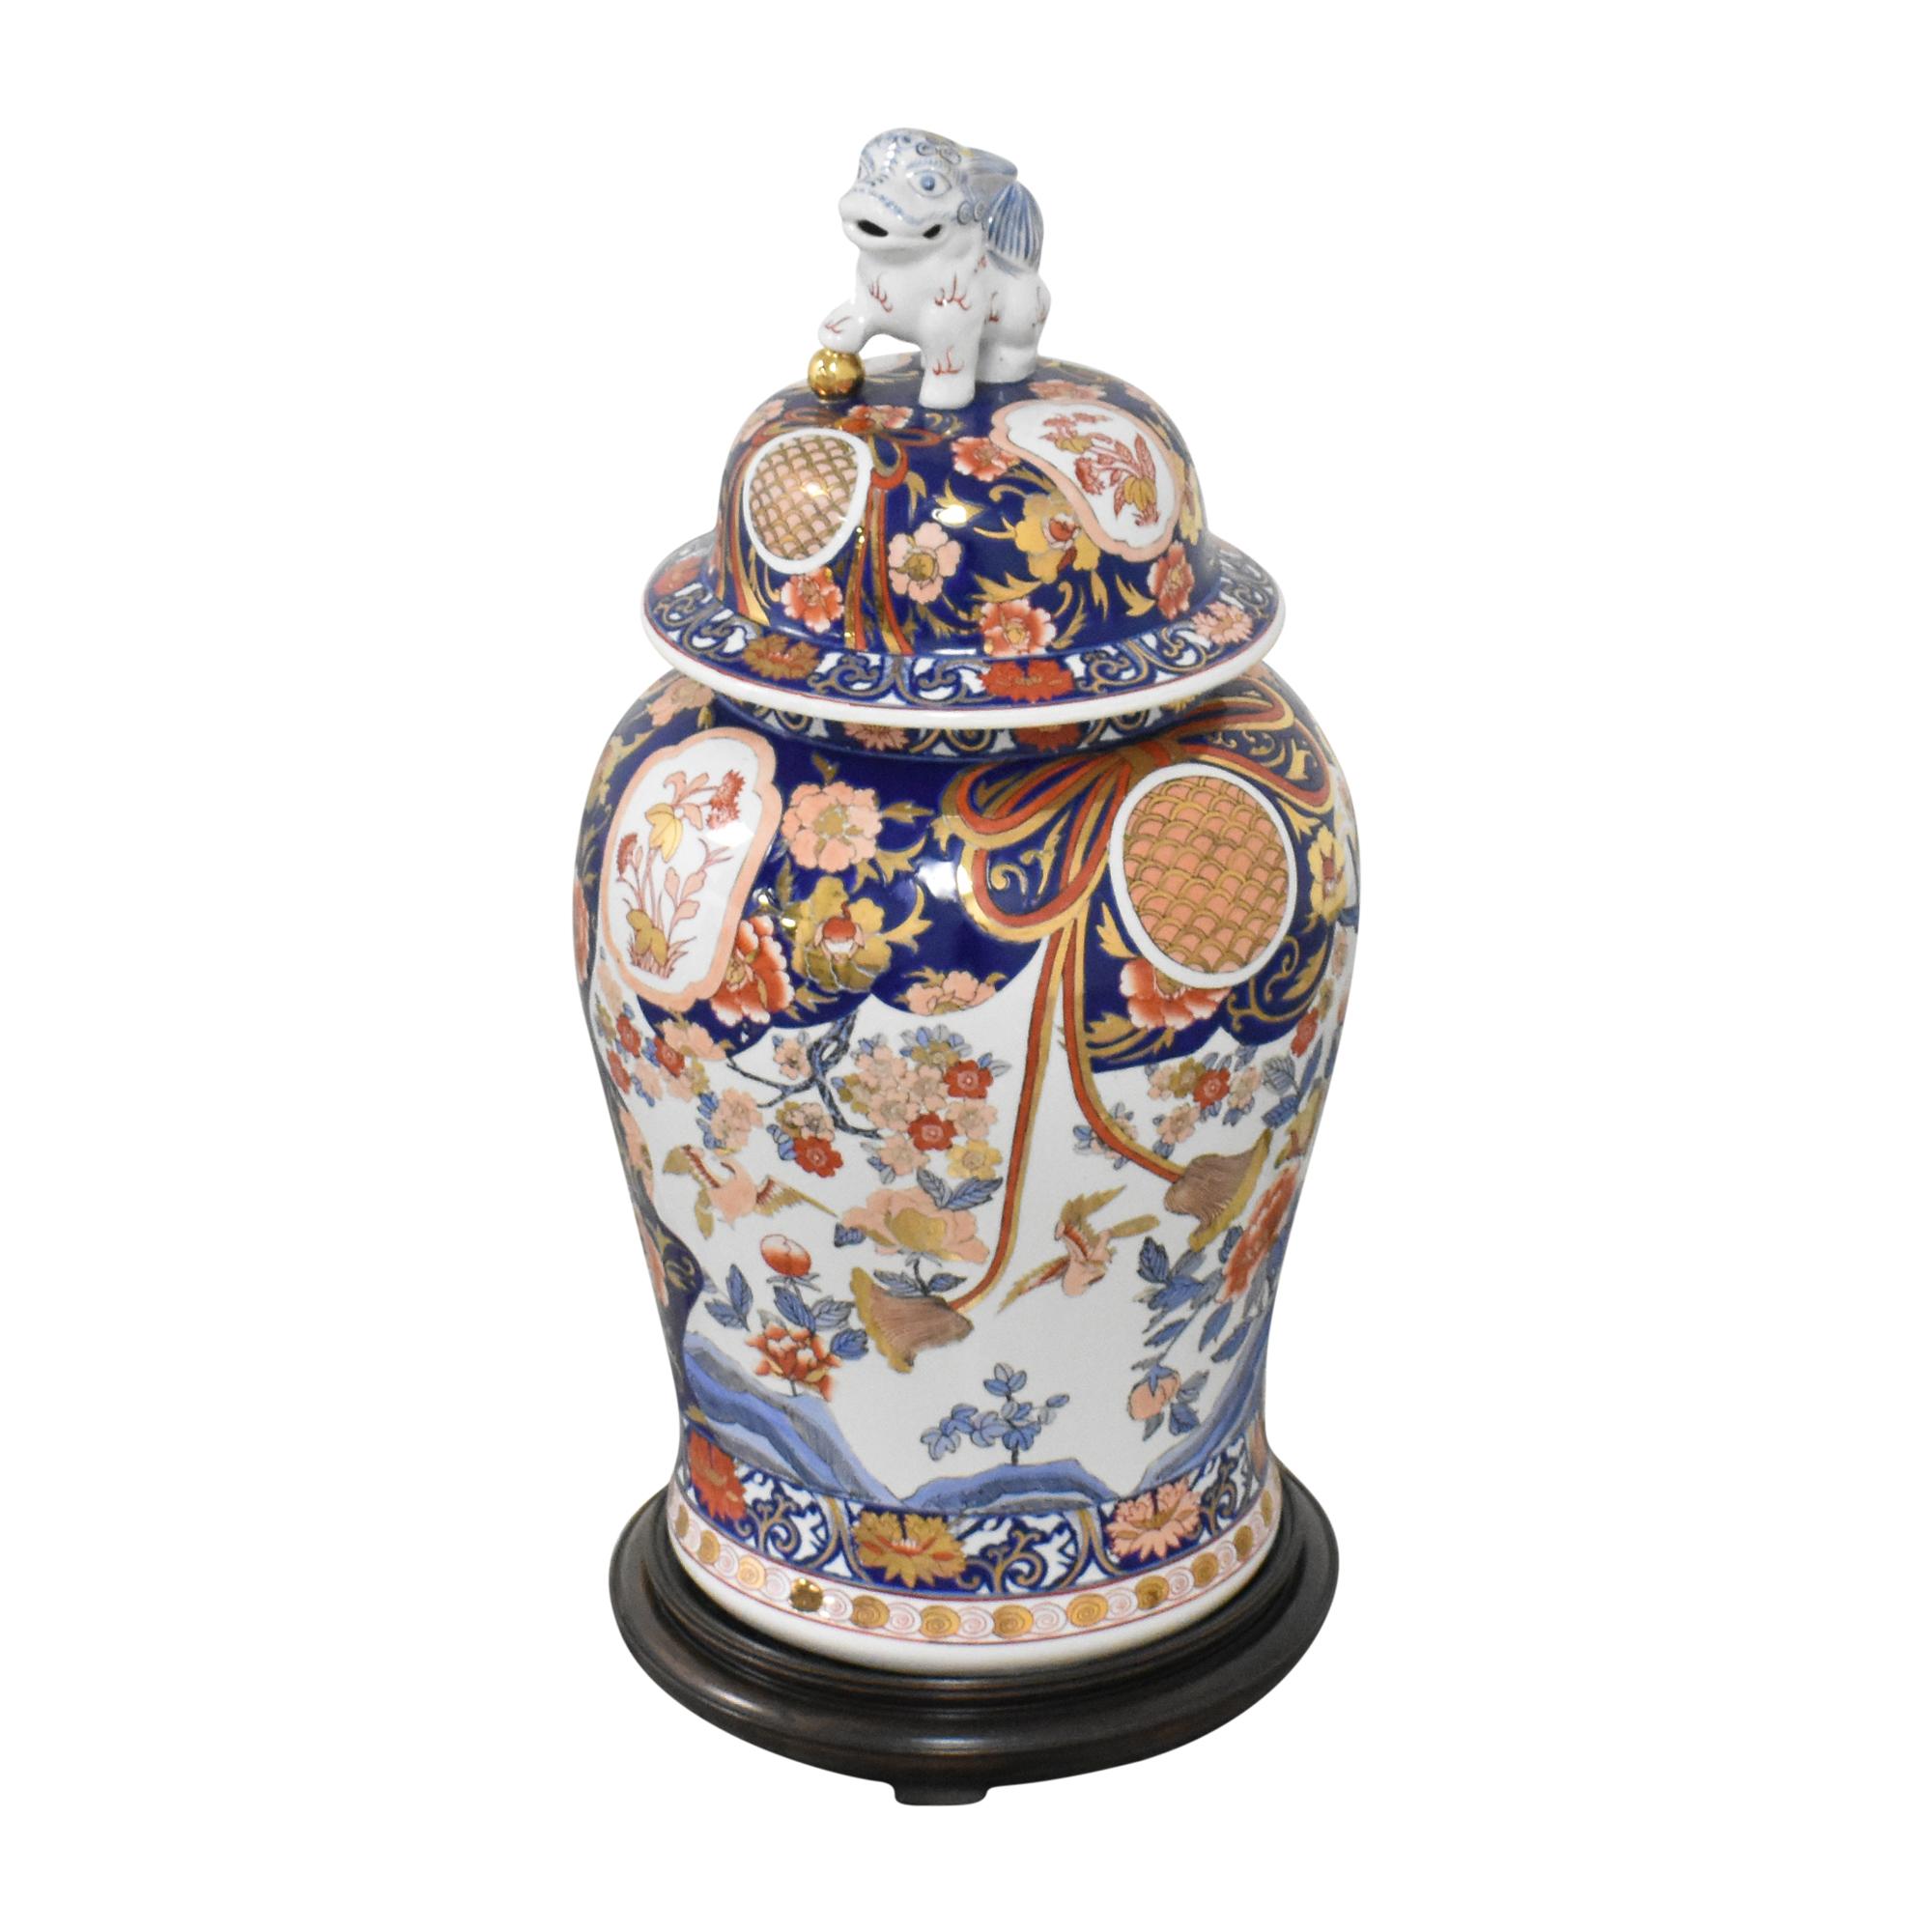 Maitland-Smith Maitland-Smith Decorative Vase Decor